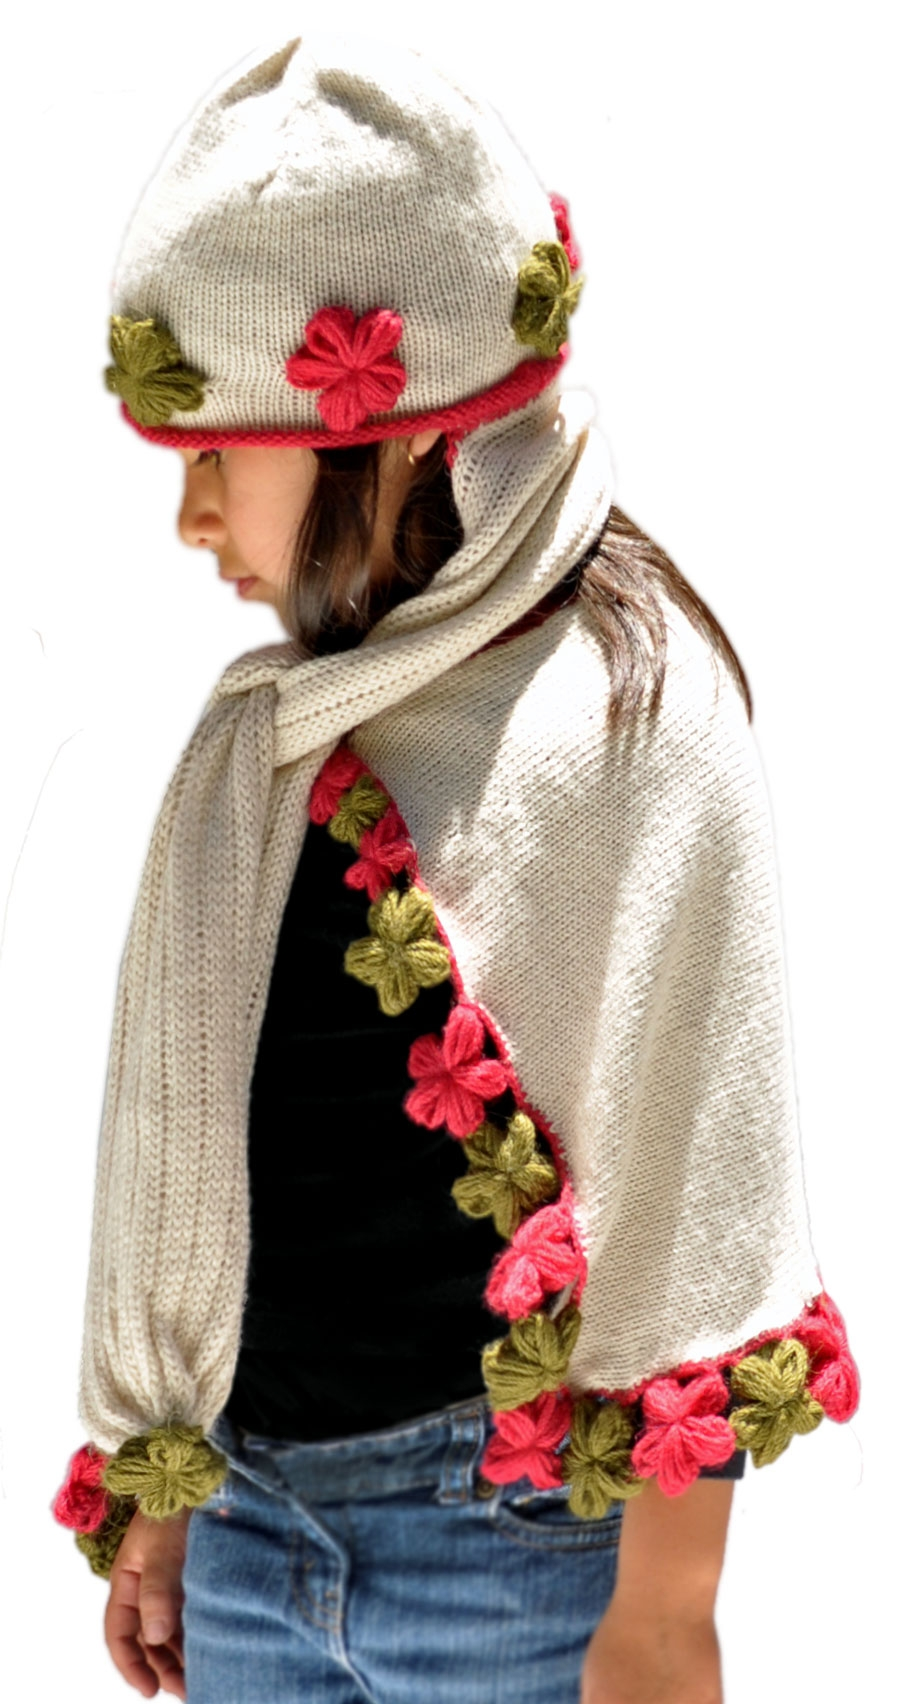 ... gorro-bufanda para niña - lana de alpaca. Blanco crudo. Loading zoom 3647f103a46